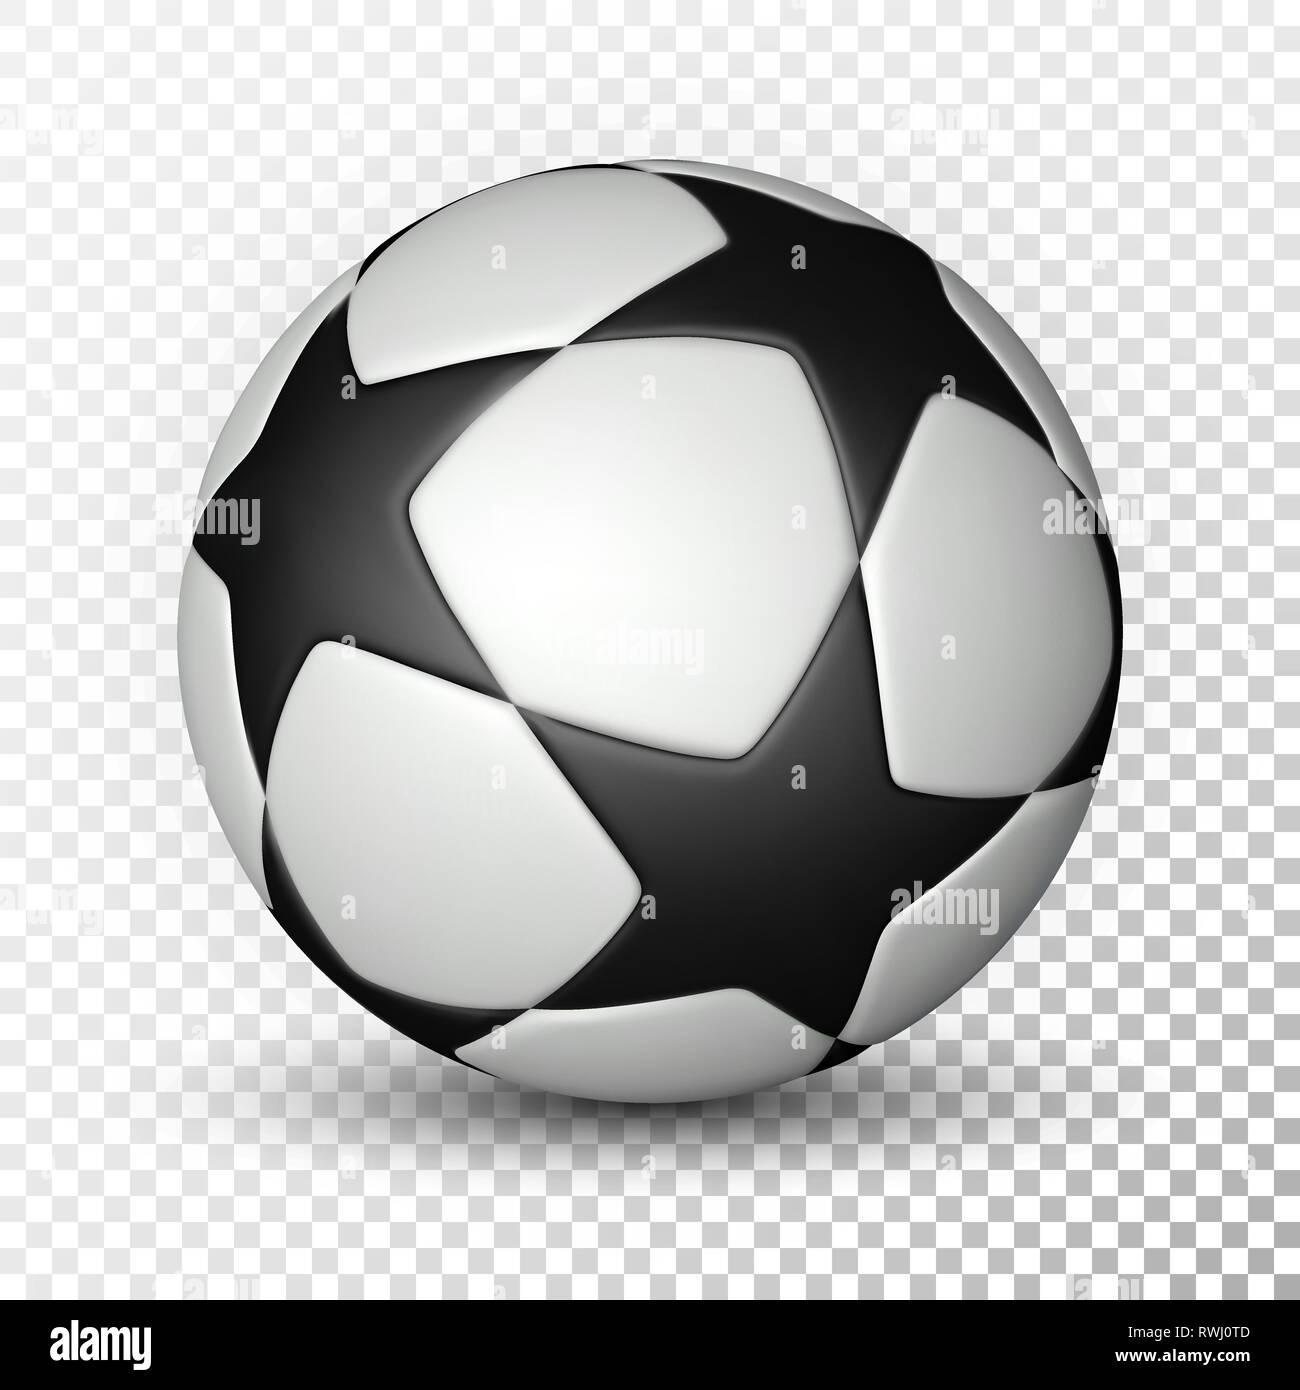 Football Ball Soccer Ball On Transparent Background Vector Illustration Stock Vector Image Art Alamy